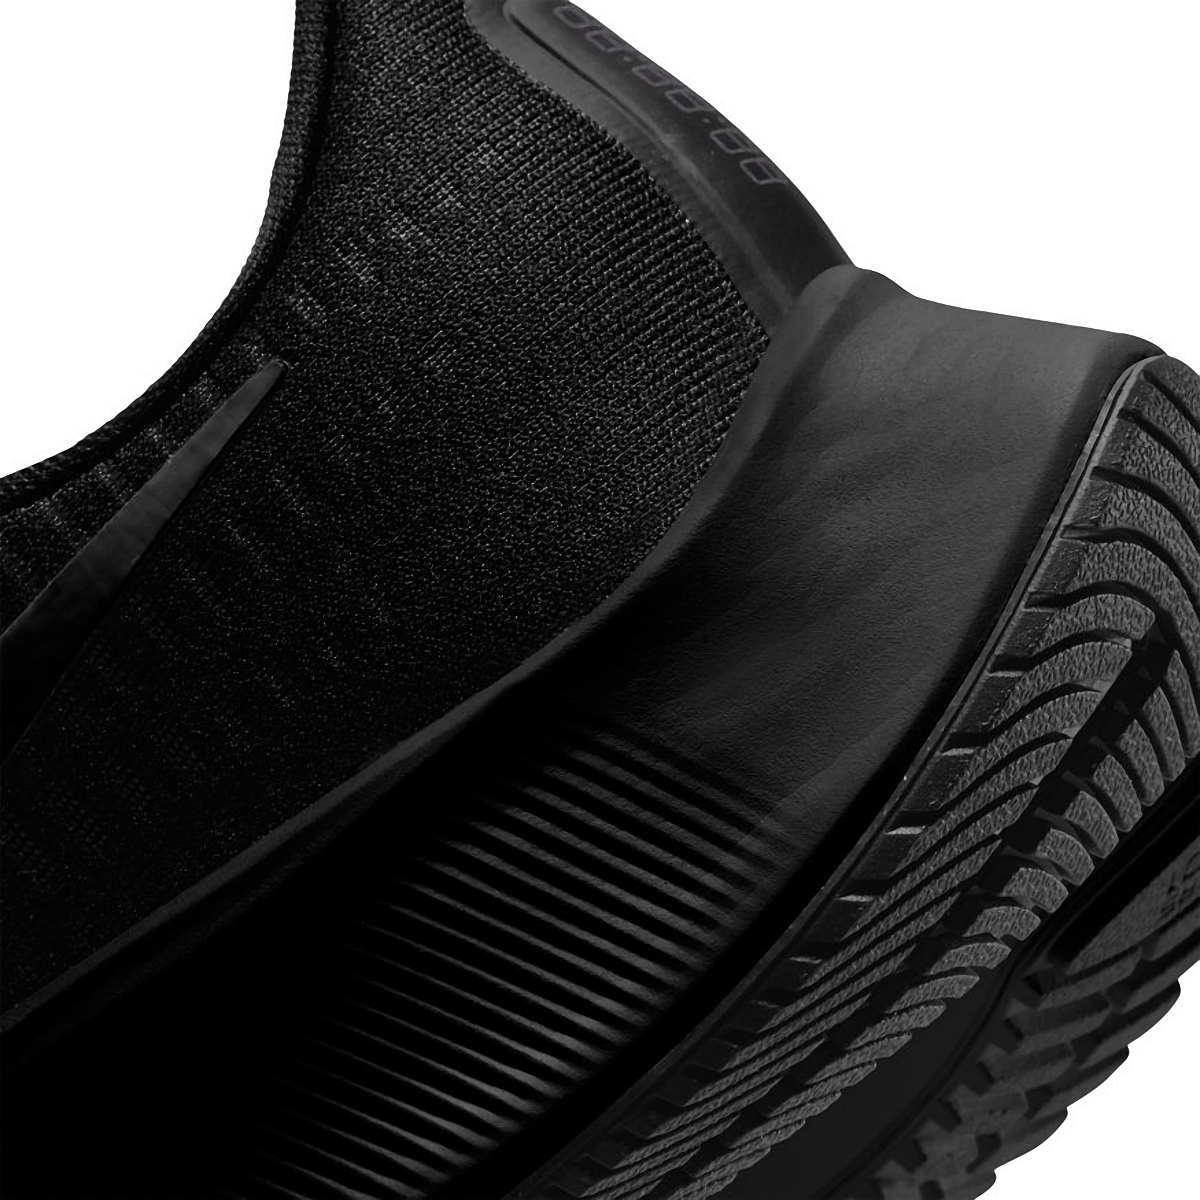 Men's Nike Nike Air Zoom Pegasus 37 Running Shoe - Color: Black/Black/Smoke Grey - Size: 6.5 - Width: Regular, Black/Black/Smoke Grey, large, image 4